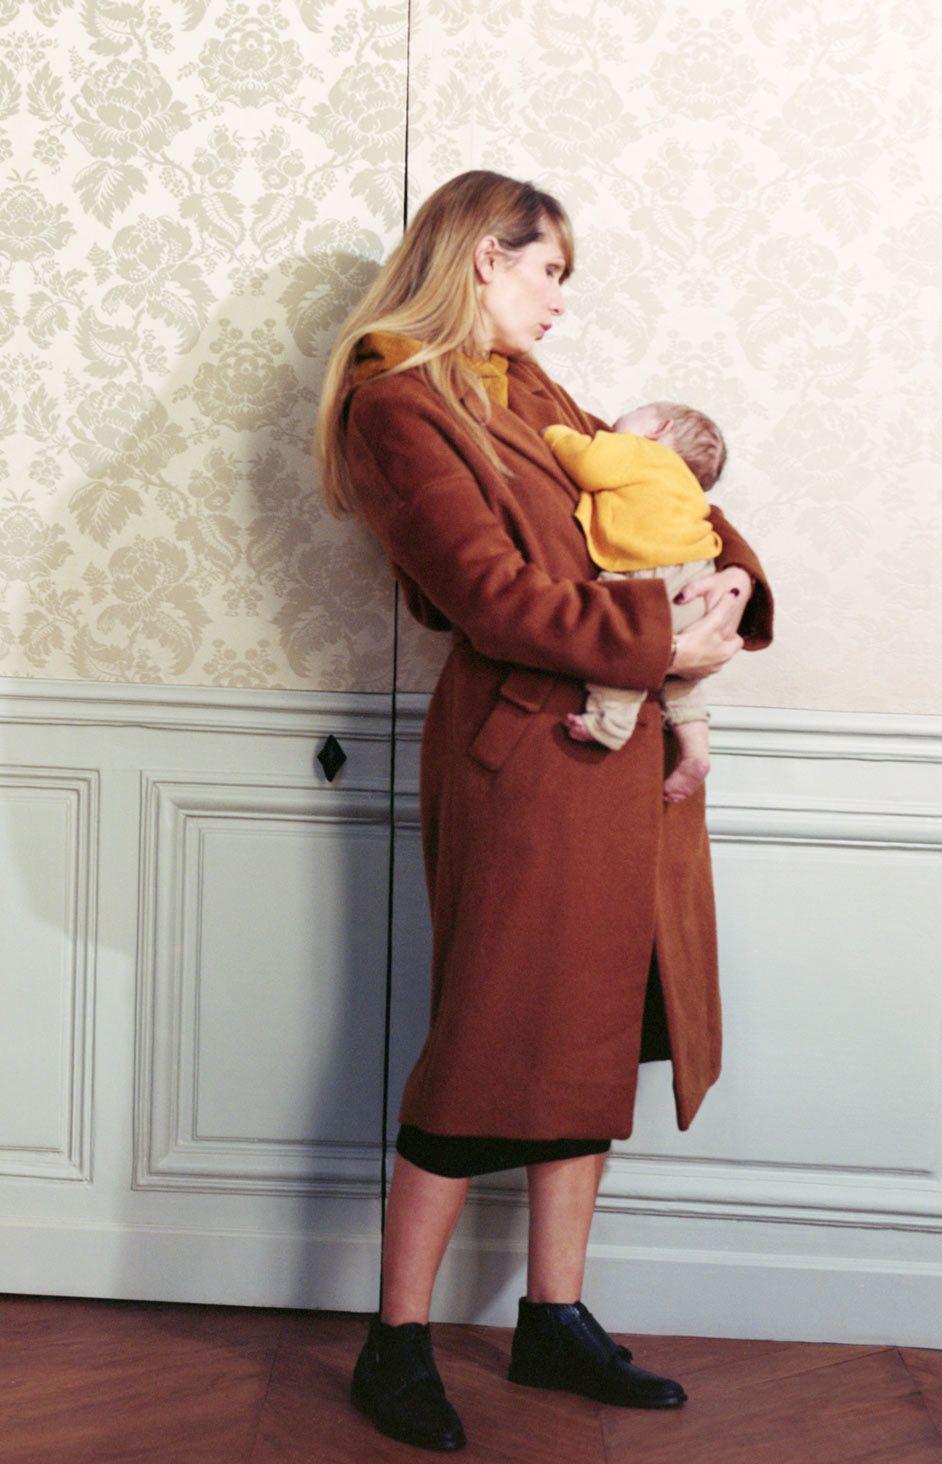 maman entrepreneure Nathalie Rozborski Nelly Rodi Conseil mode